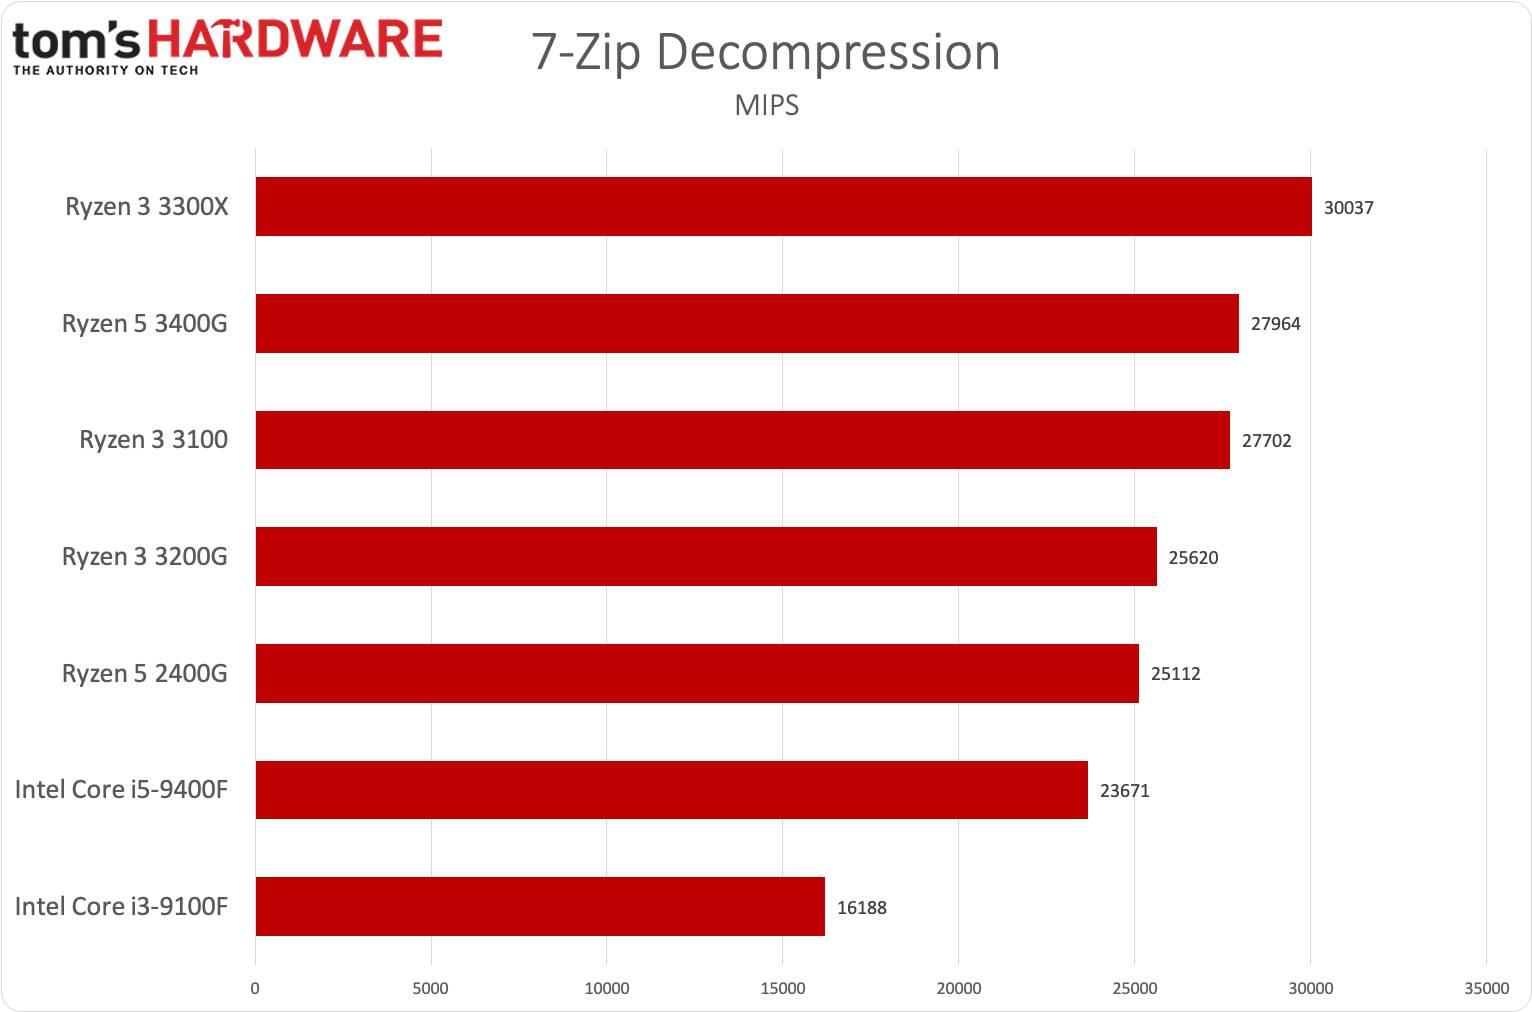 Ryzen 3 3300X e Ryzen 3 3100 - 7-Zip decompression